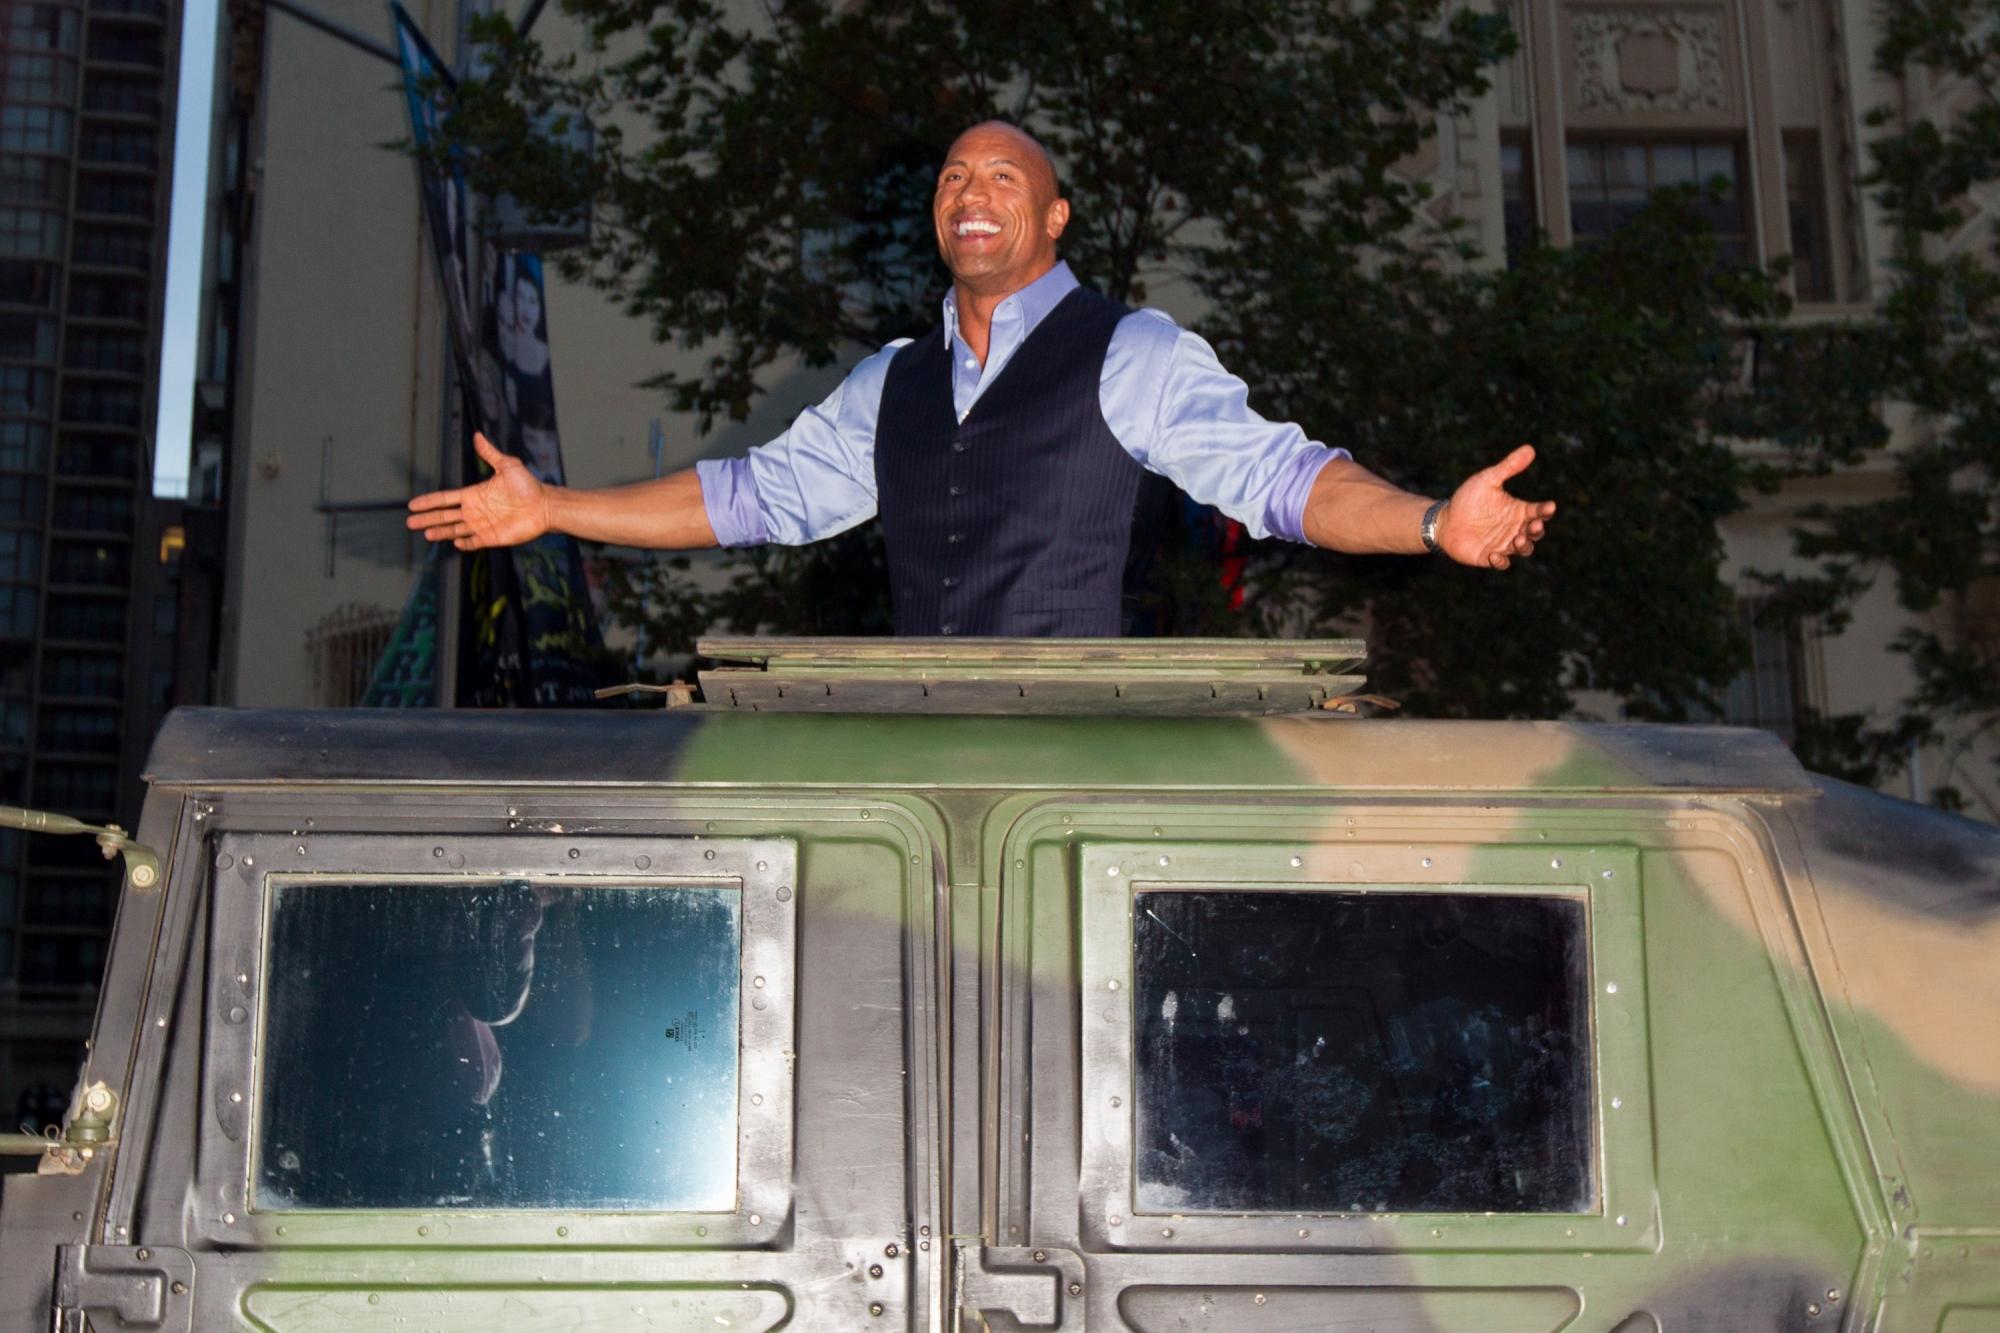 Dwayne Johnson Is Powerful In G.I. JOE RETALIATION, A Must See Film!